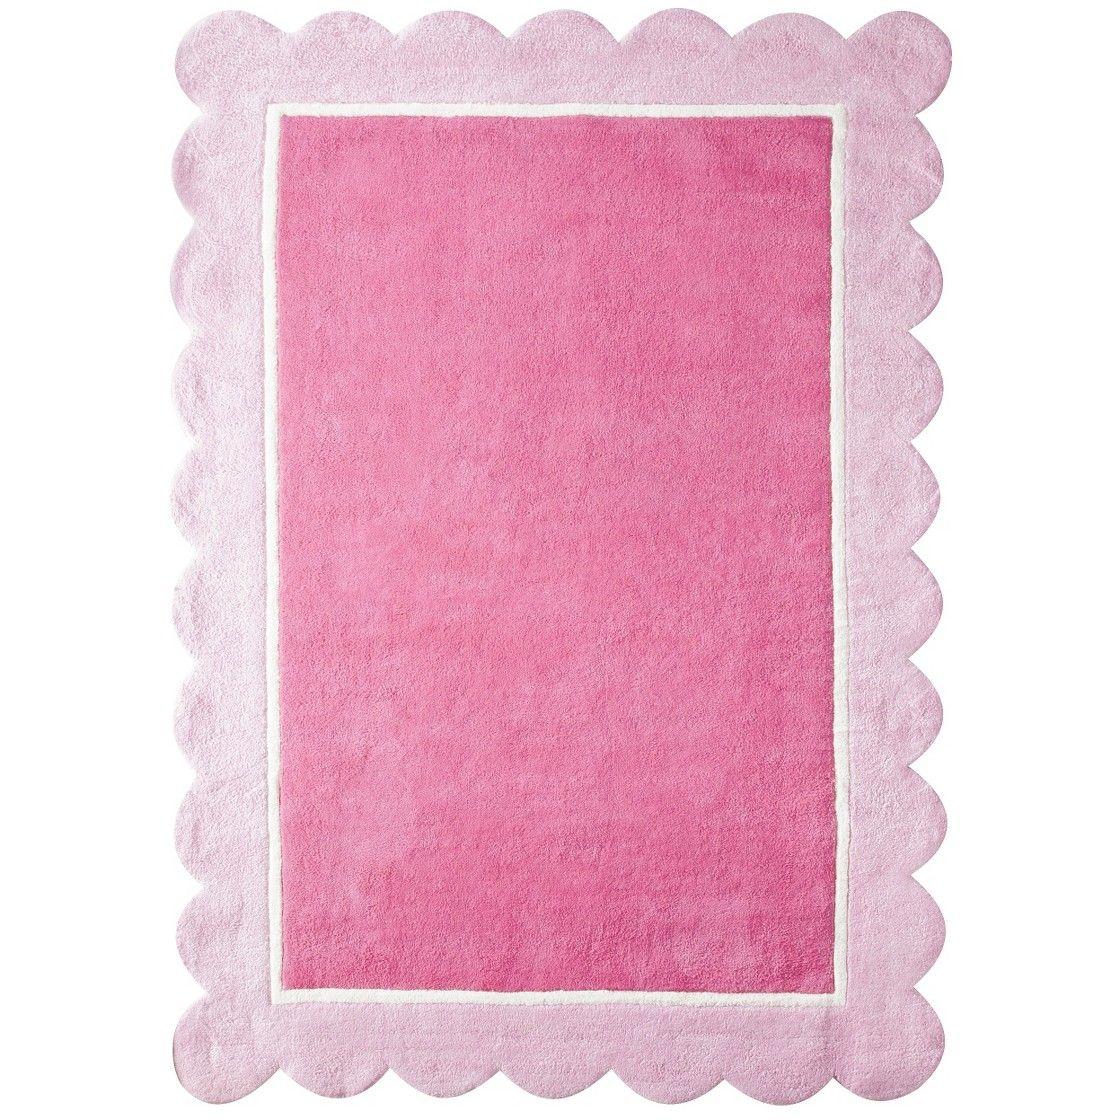 "Circo� Girl's Scalloped Border Accent Rug - Pink (4'x5'6"")"